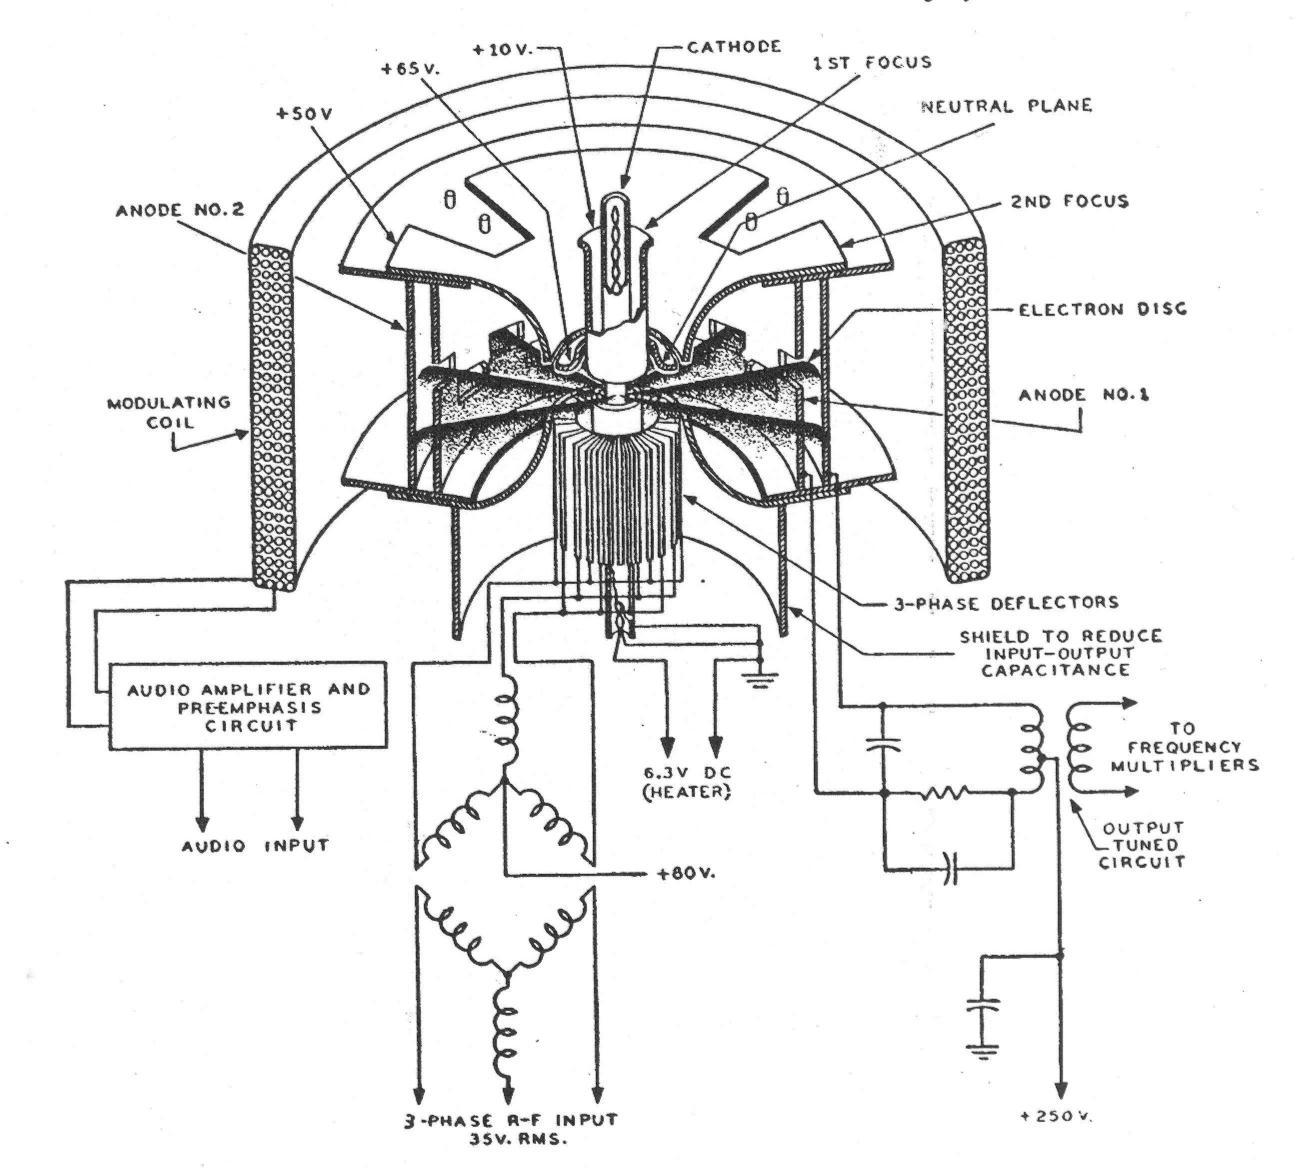 Electronic Circuits Page 430 Next